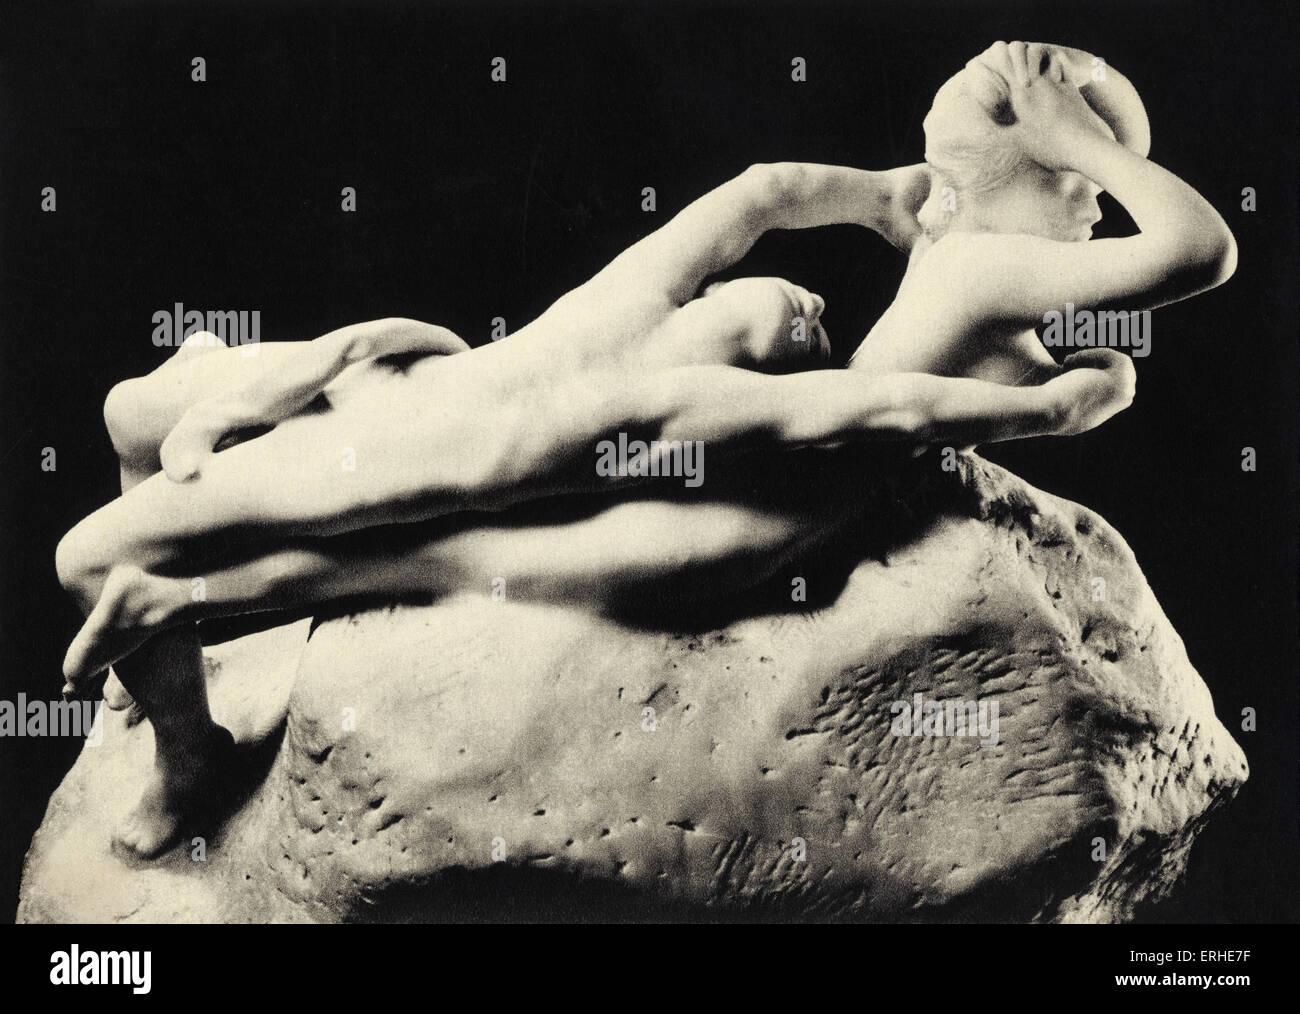 Auguste Rodin - Fugitive Love (Fugit Amor) c. 1881-87 Bronze sculpture. Musee Rodin, Paris. French sculptor, 12 - Stock Image